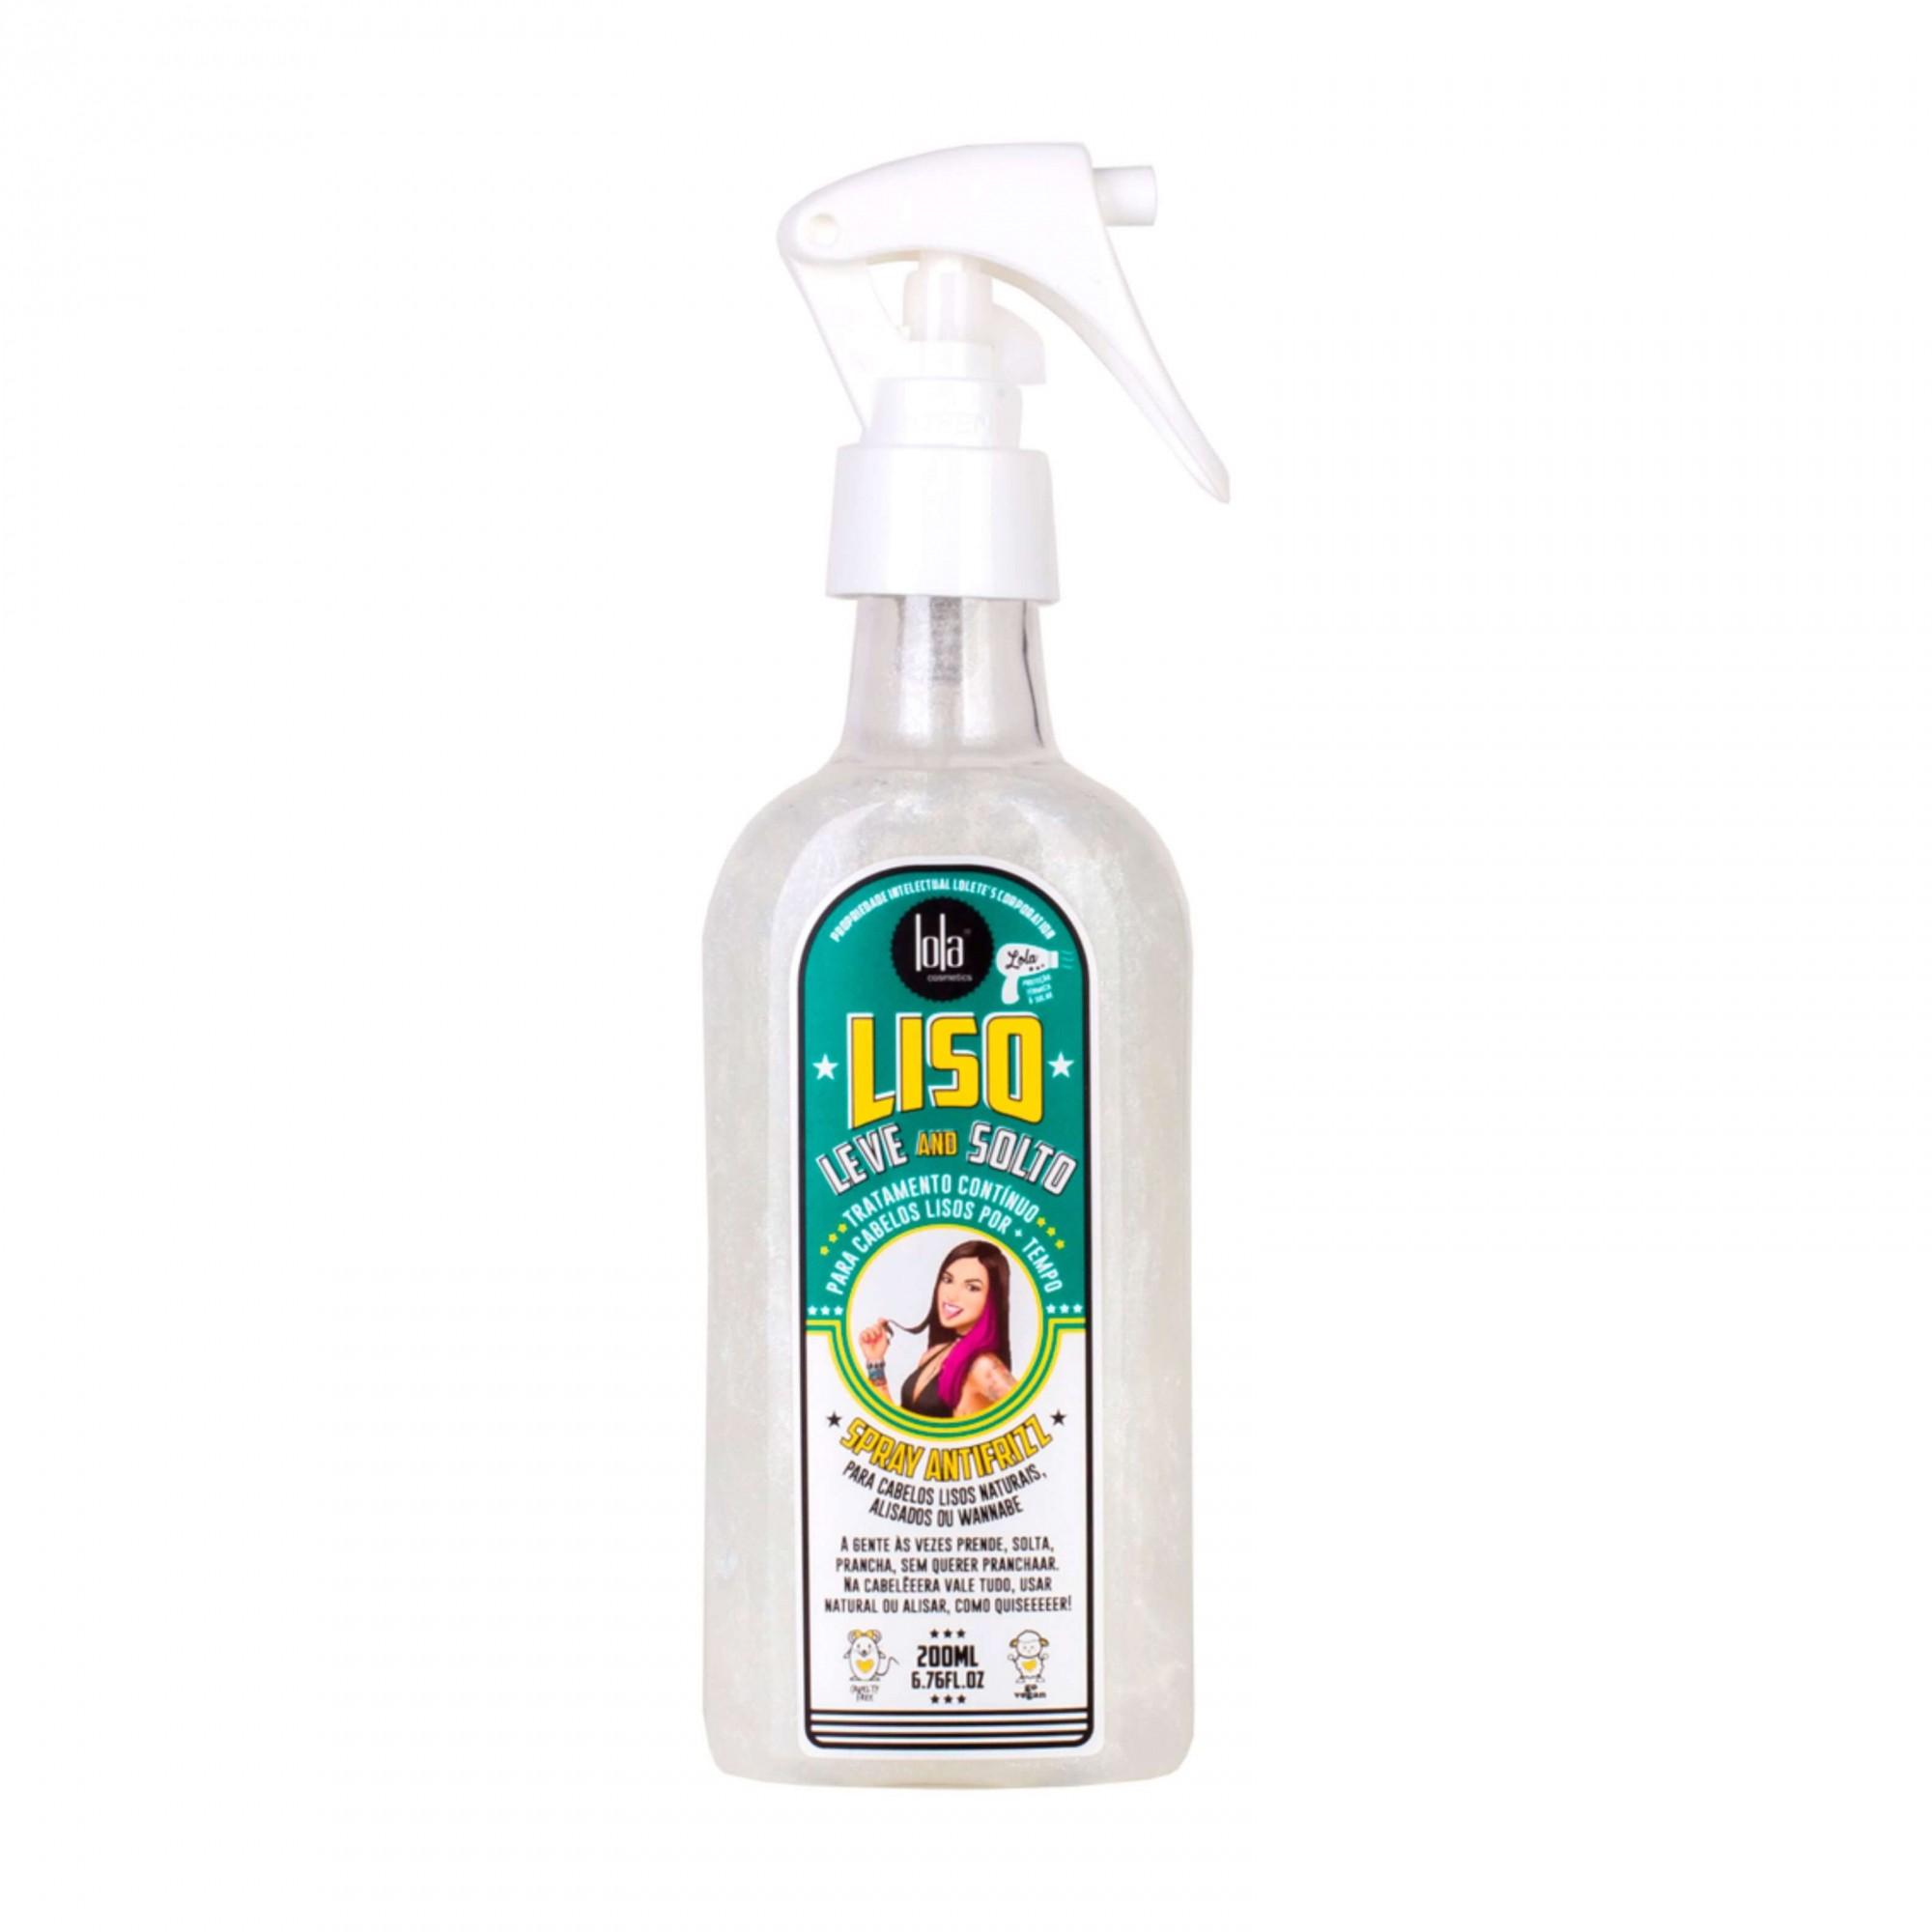 Lola Cosméticos Liso, Leve and Solto - Spray Alisador Anti-Frizz 200ml